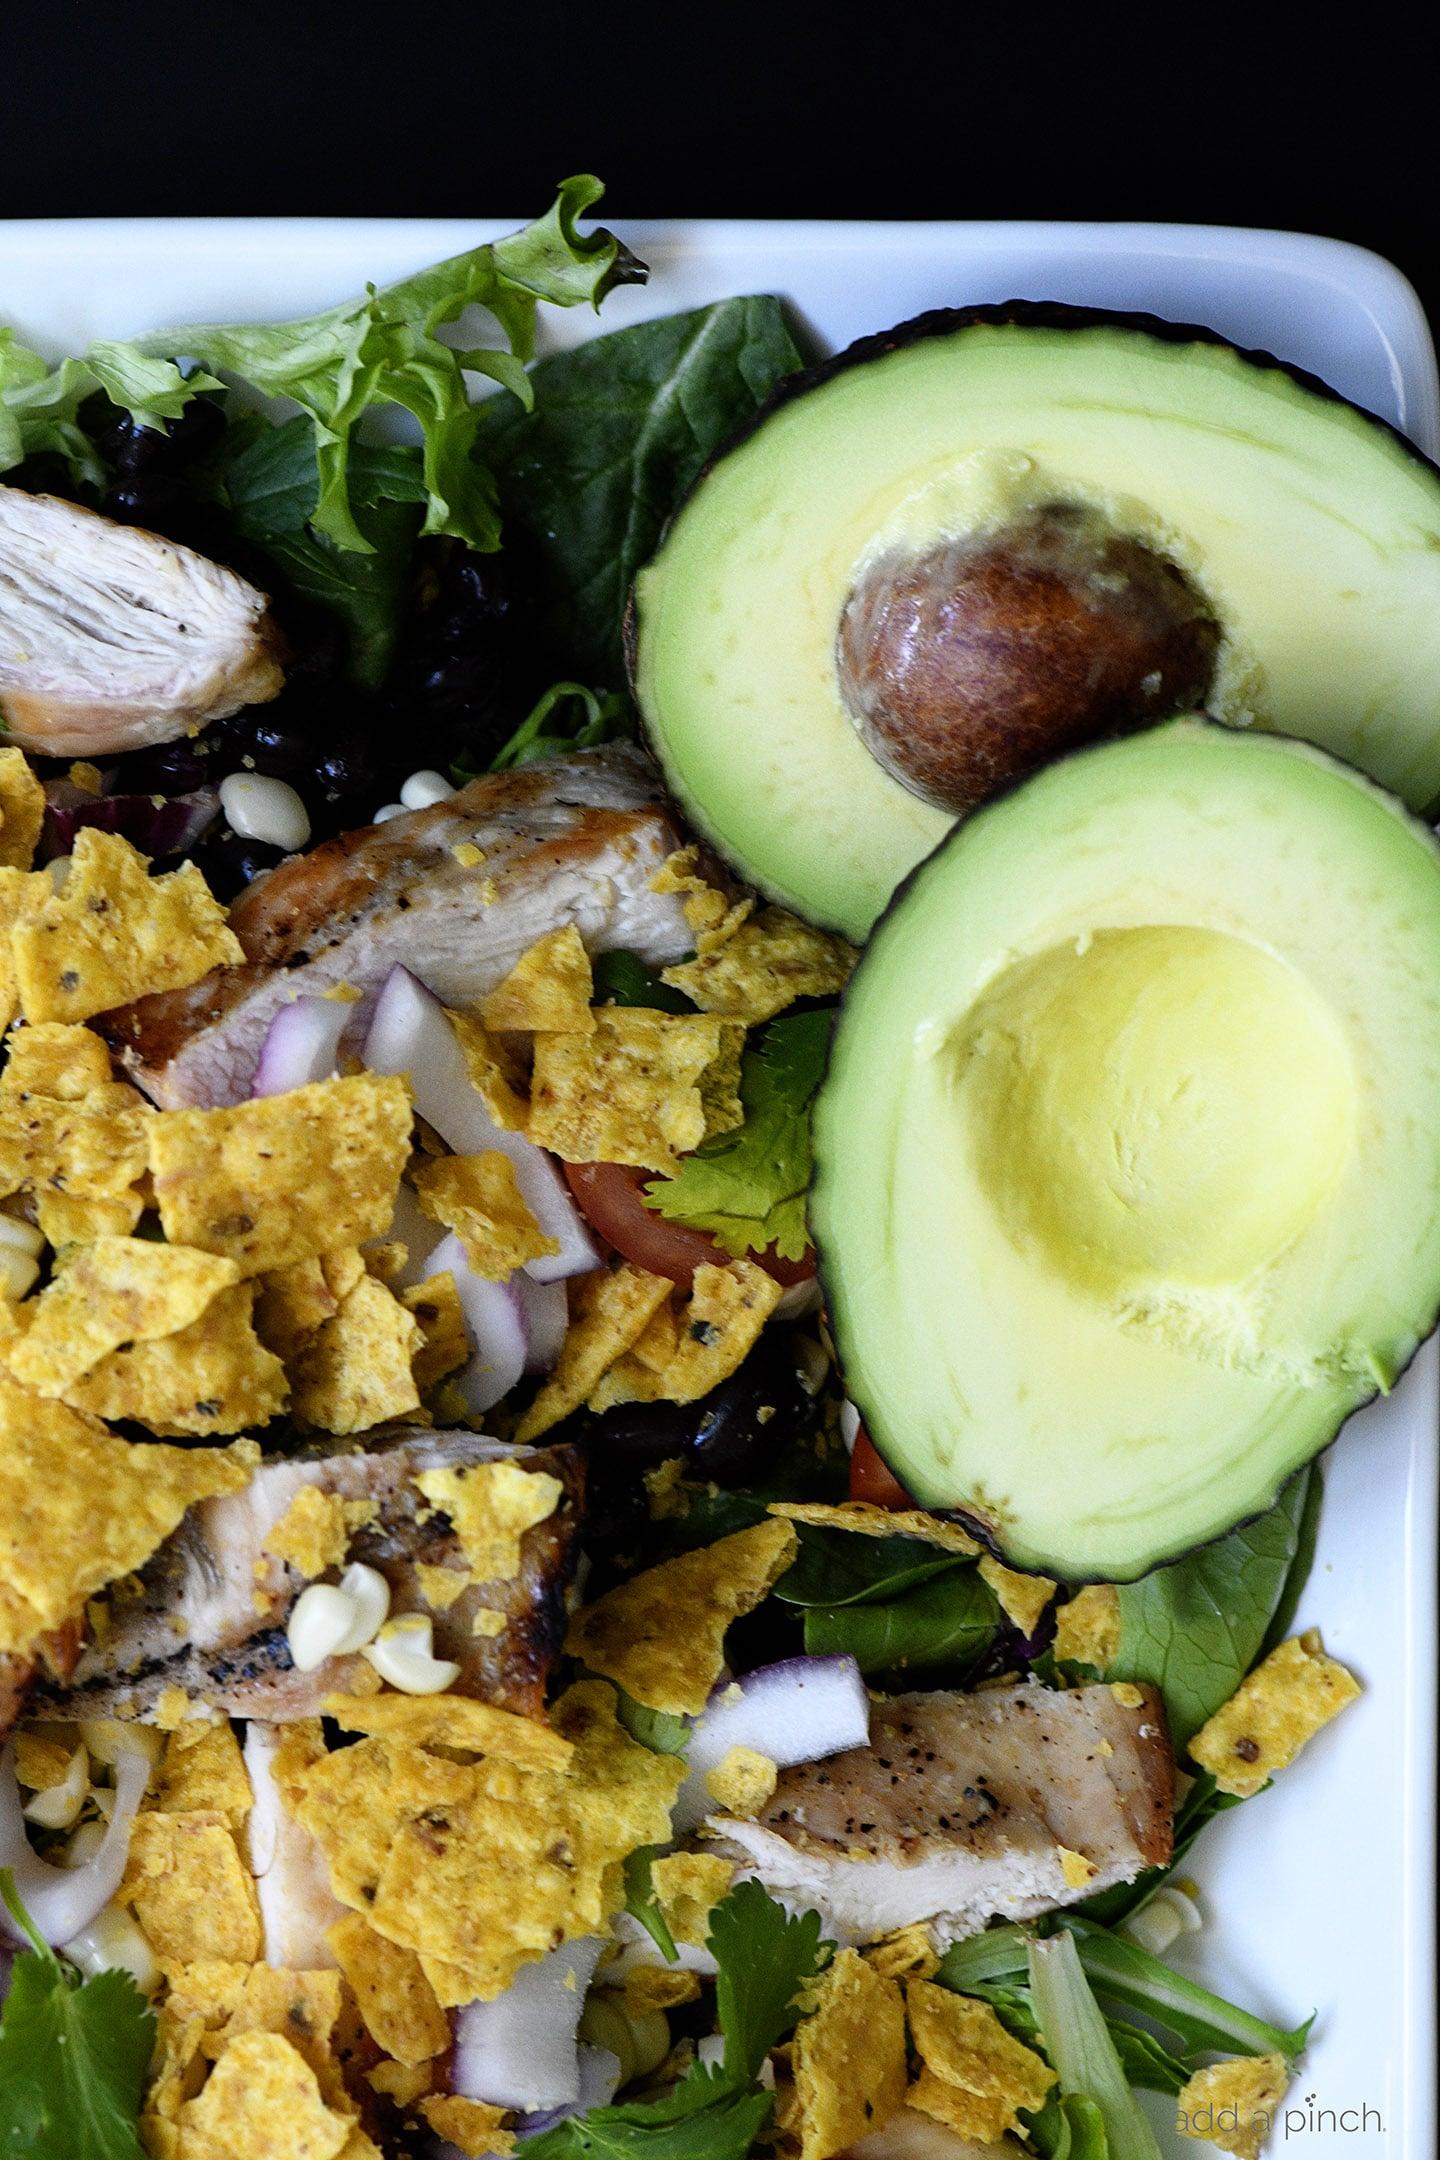 Grilled Chicken Fiesta Salad Recipe Add A Pinch Последние твиты от chicken fiesta (@chicken_fiesta). grilled chicken fiesta salad recipe